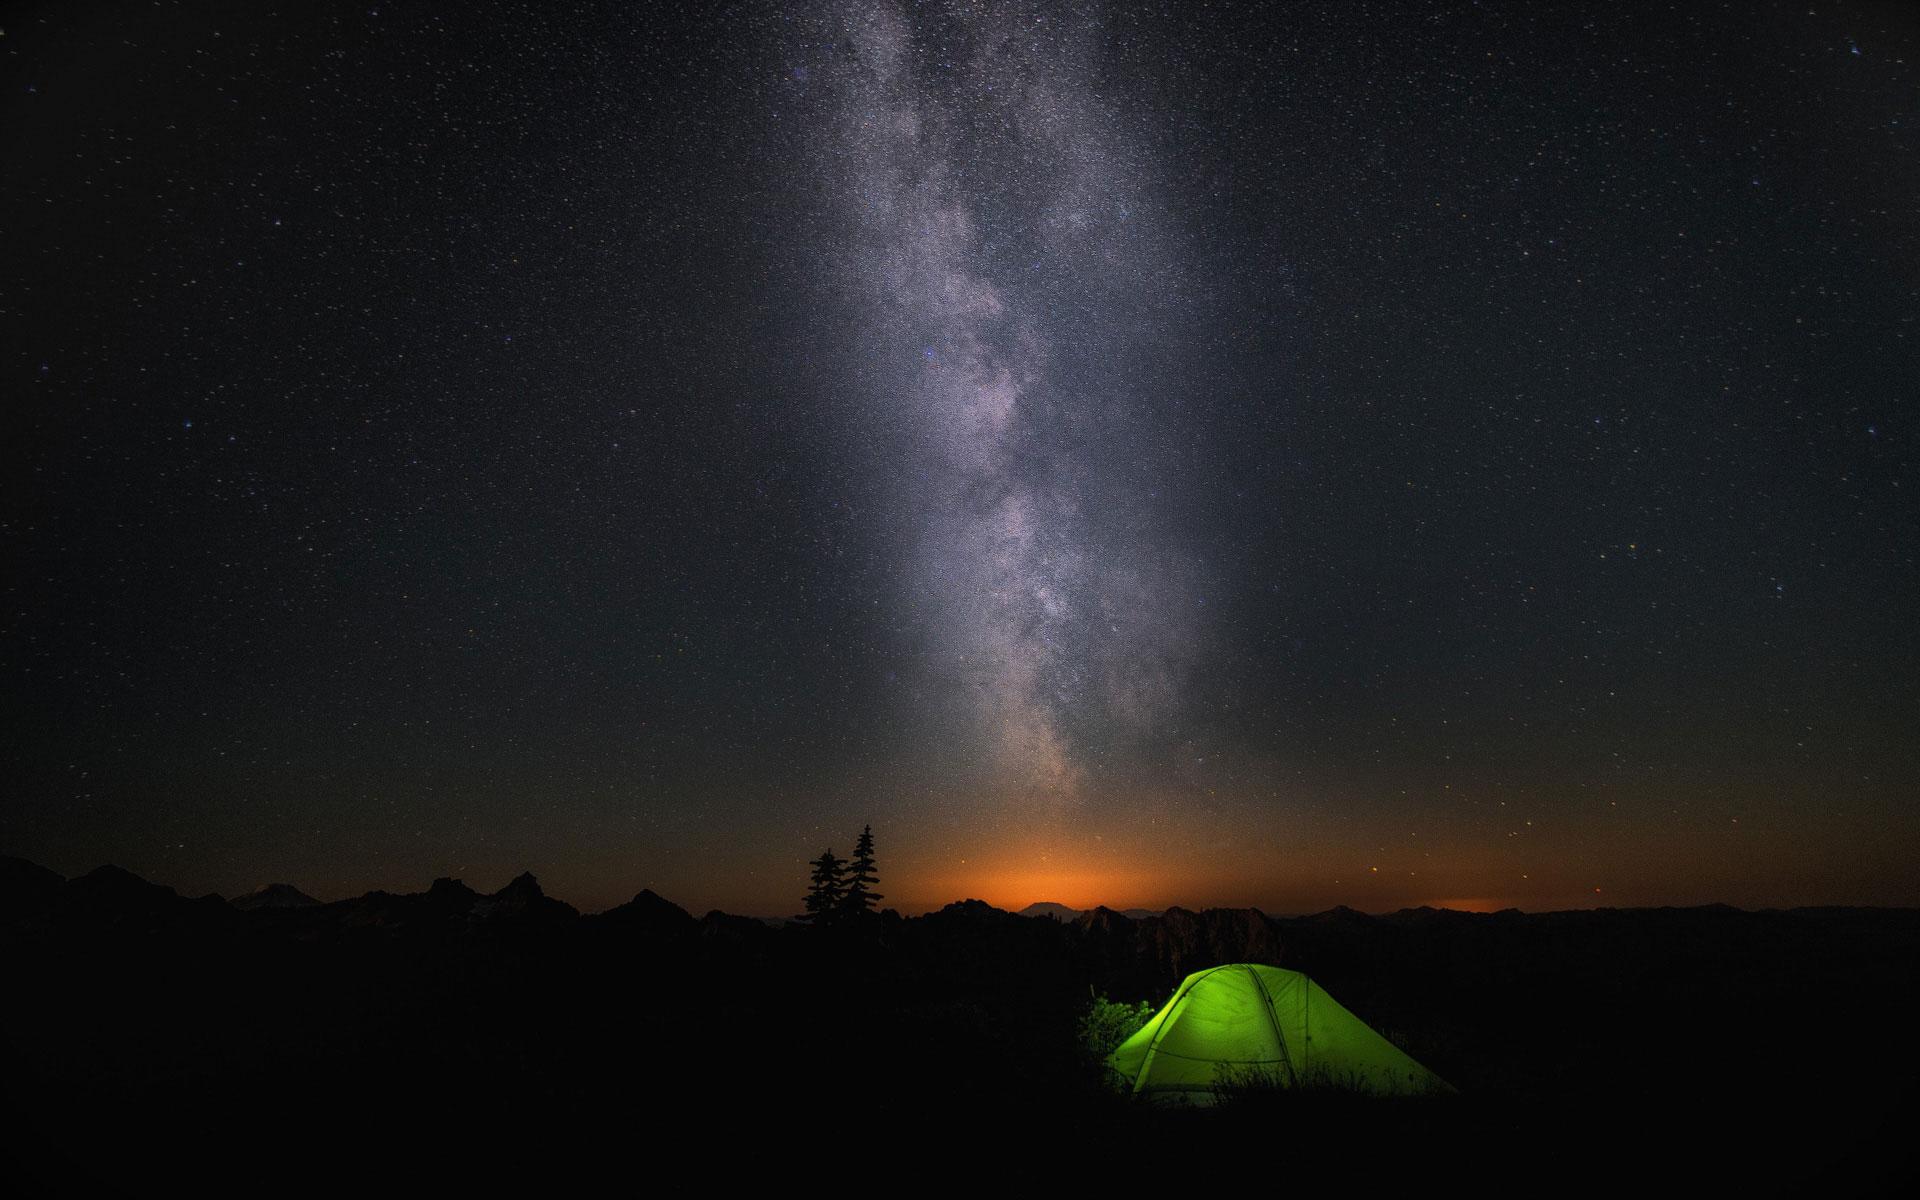 WIN10 4K高清桌面壁纸欣赏 仰望星空拥抱自然